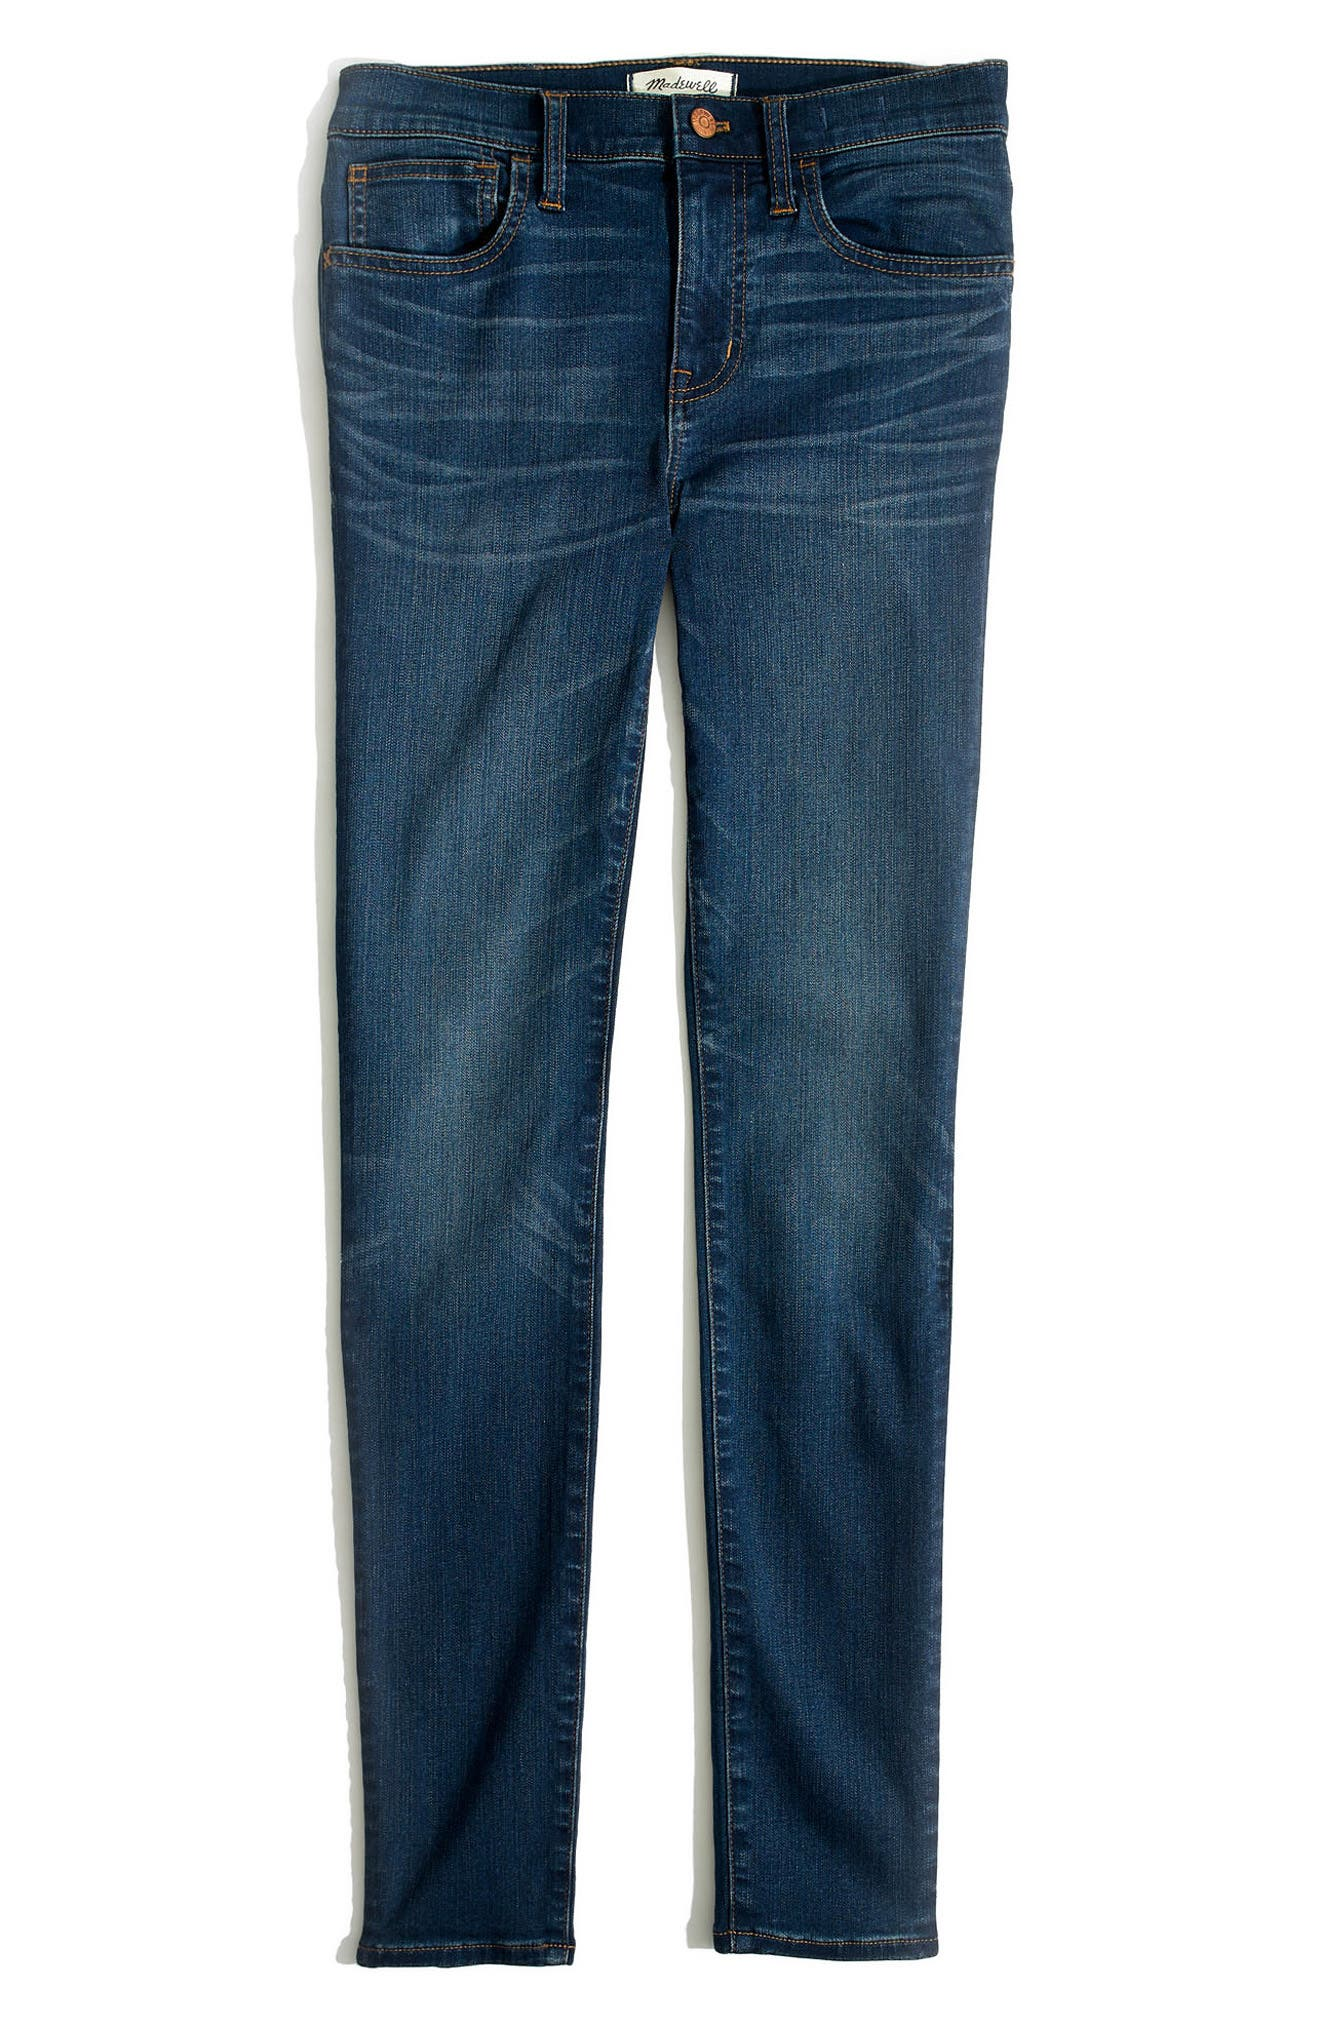 Roadtripper High Waist Skinny Jeans,                             Alternate thumbnail 4, color,                             Orson Wash